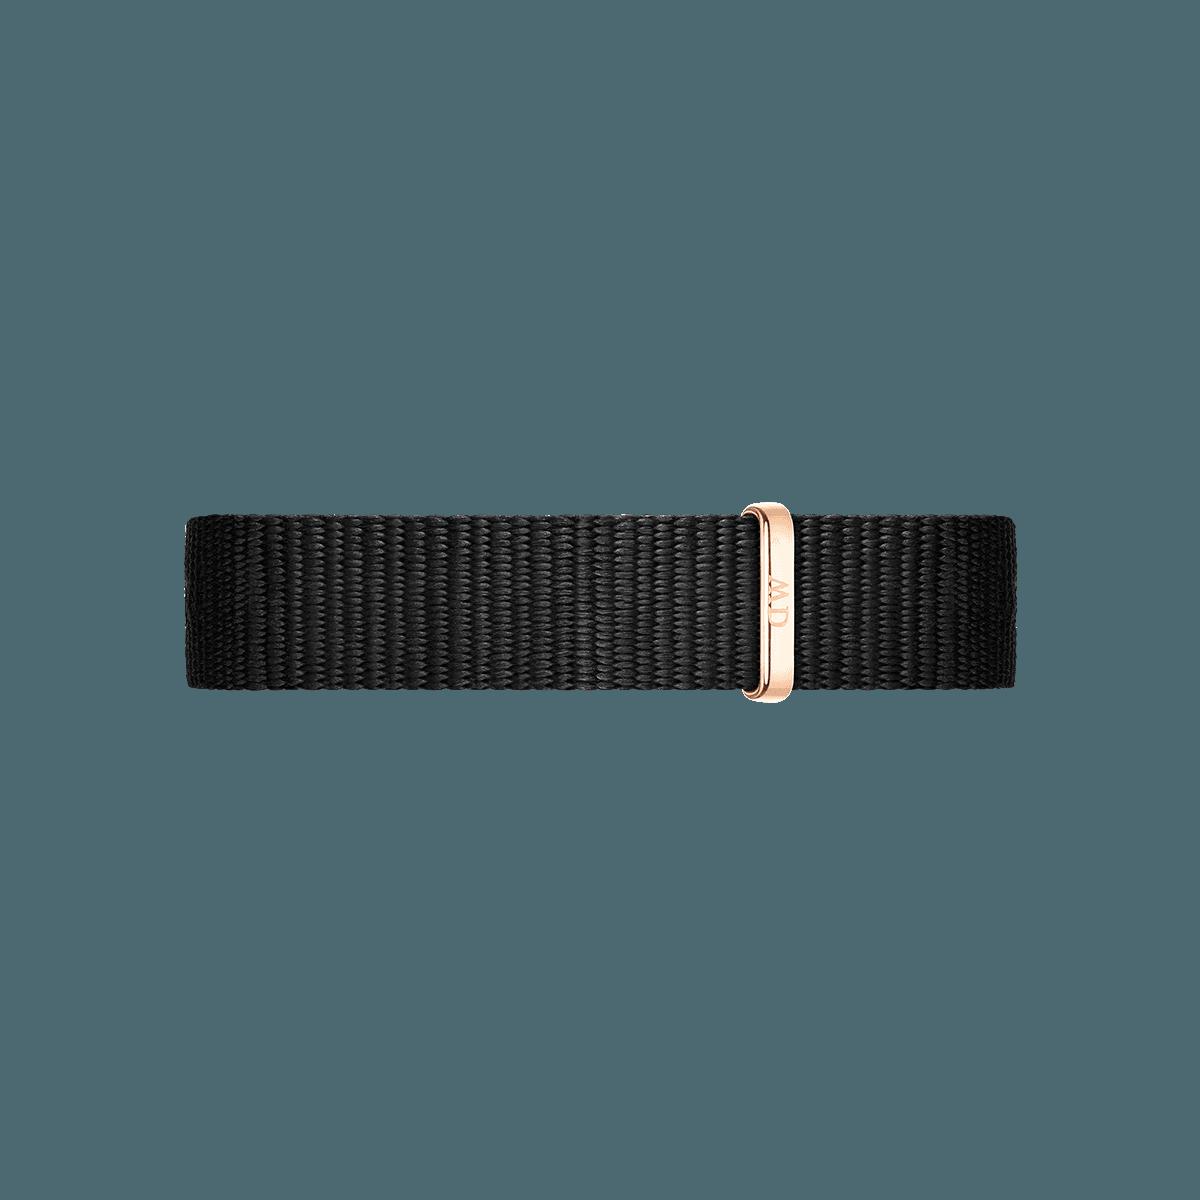 dw官网 dw手表官网 dw中国官网 dw官方旗舰店 DW DW官网  Watch band Petite RG 12mm Cornwall